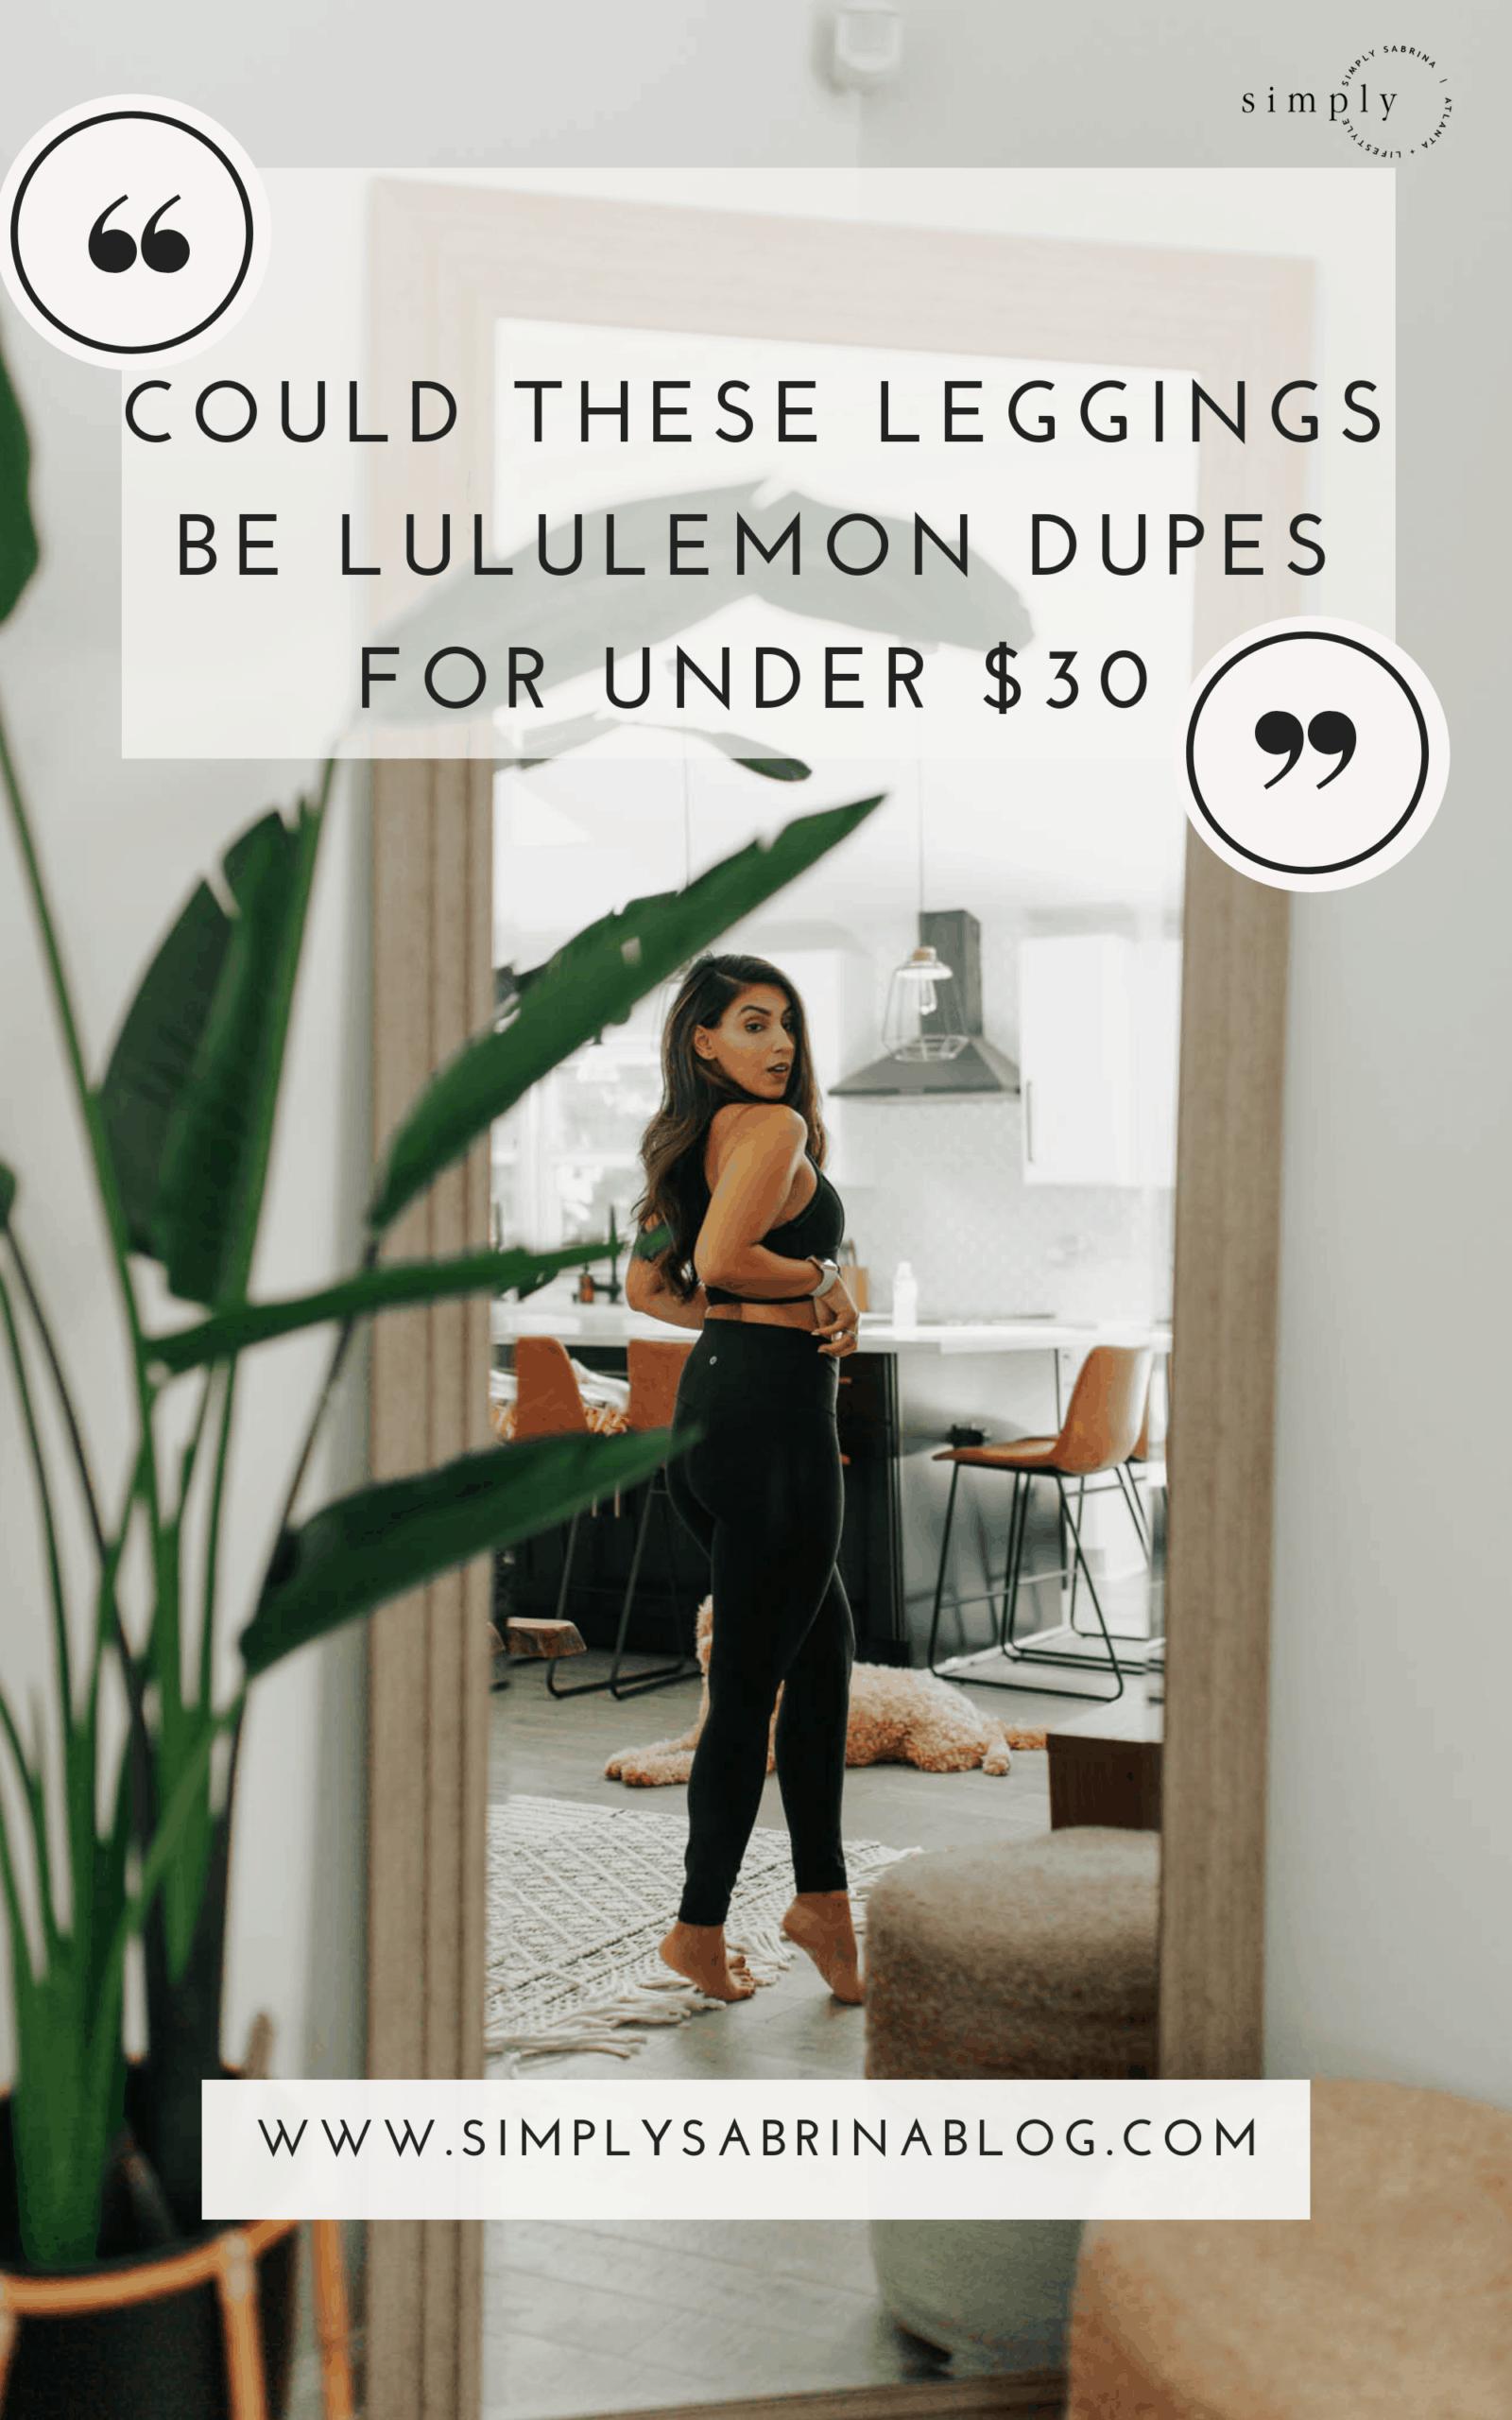 lululemon dupes, lululemon leggings, aerie leggings